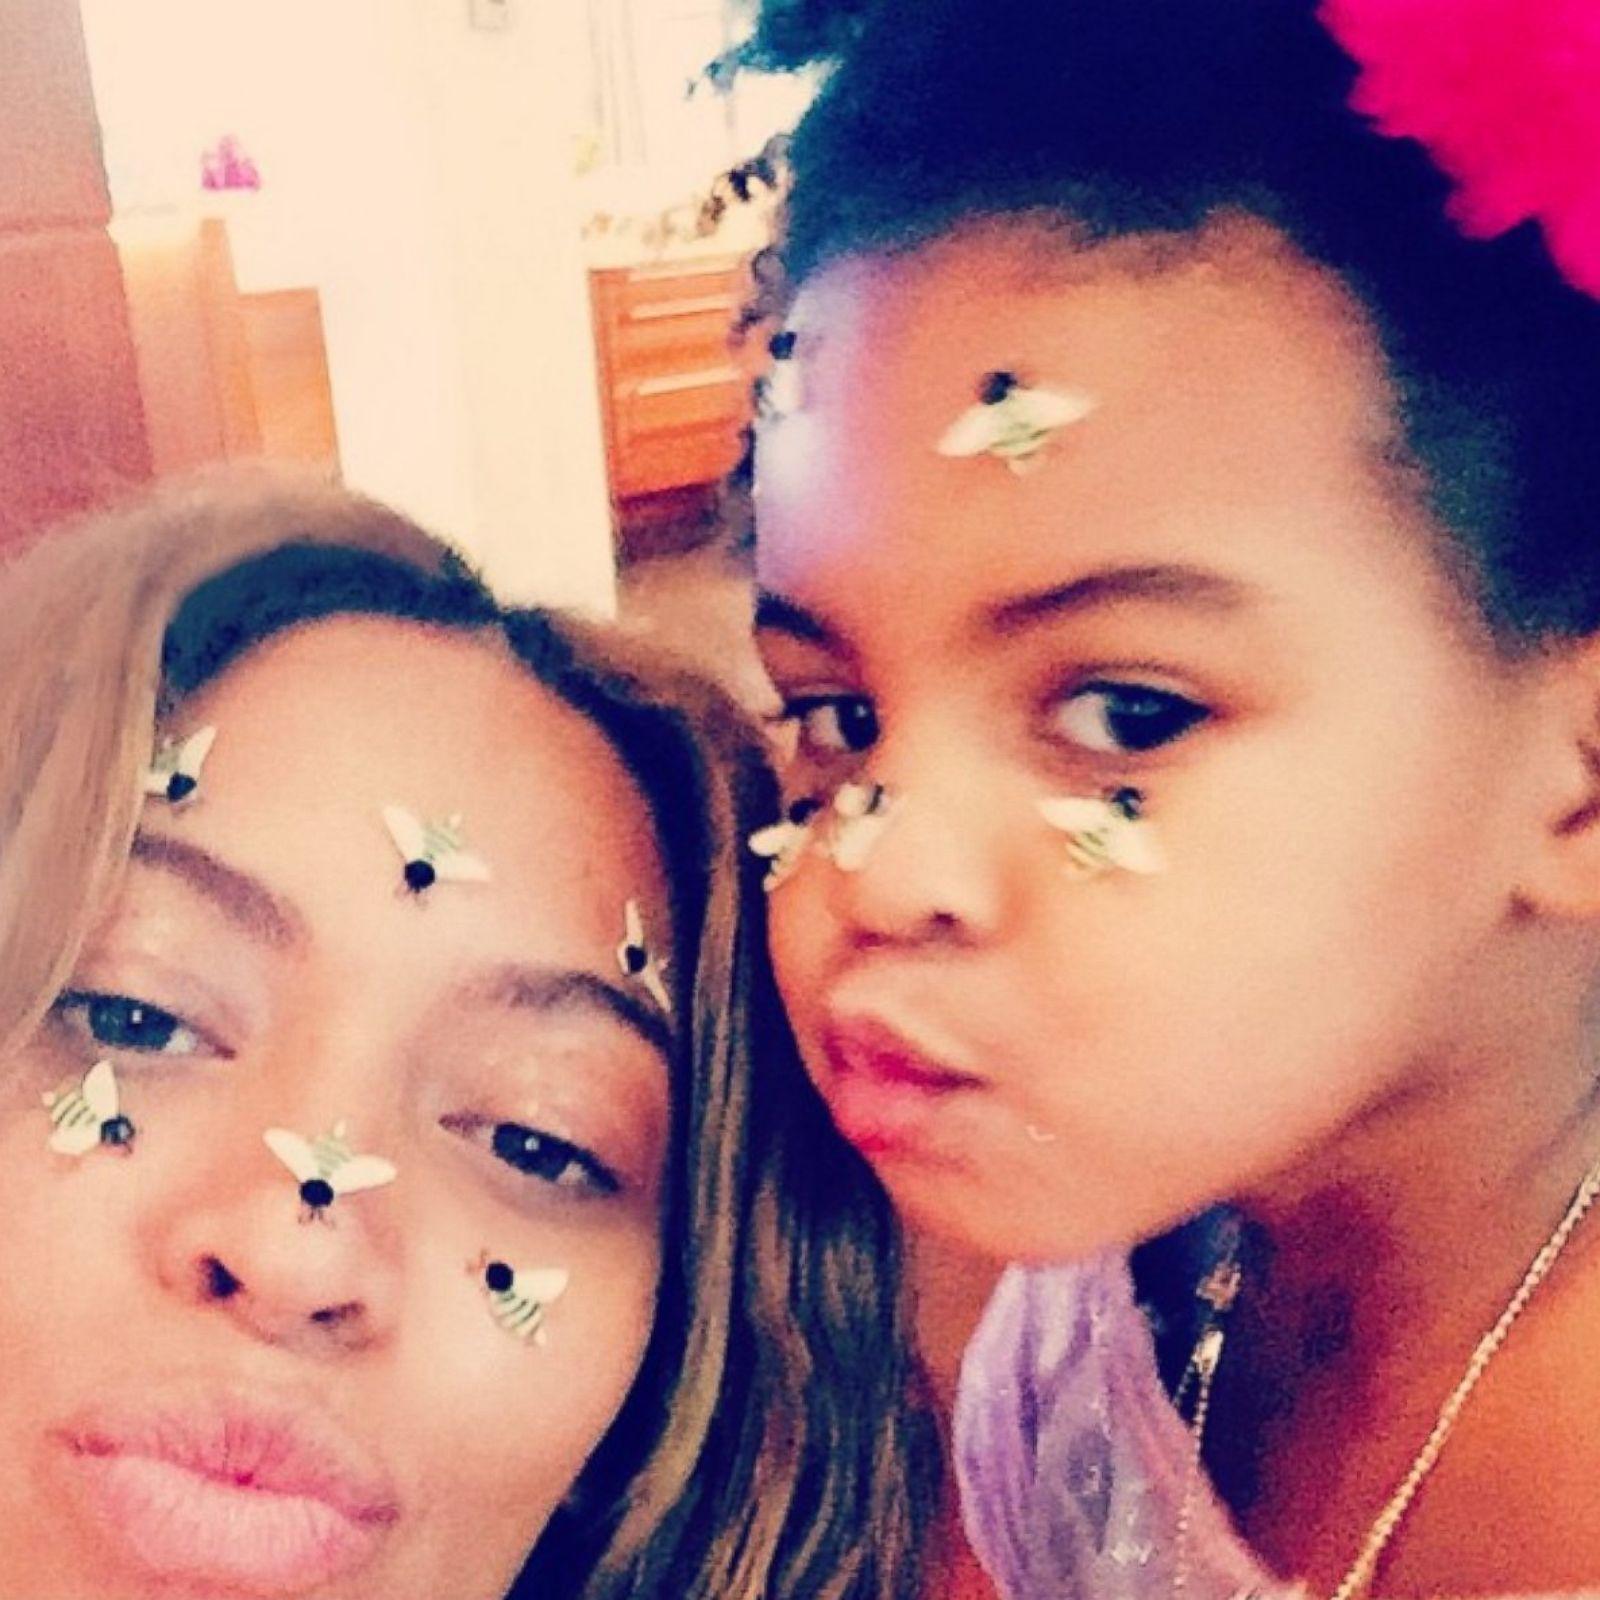 Beyoncé selfie